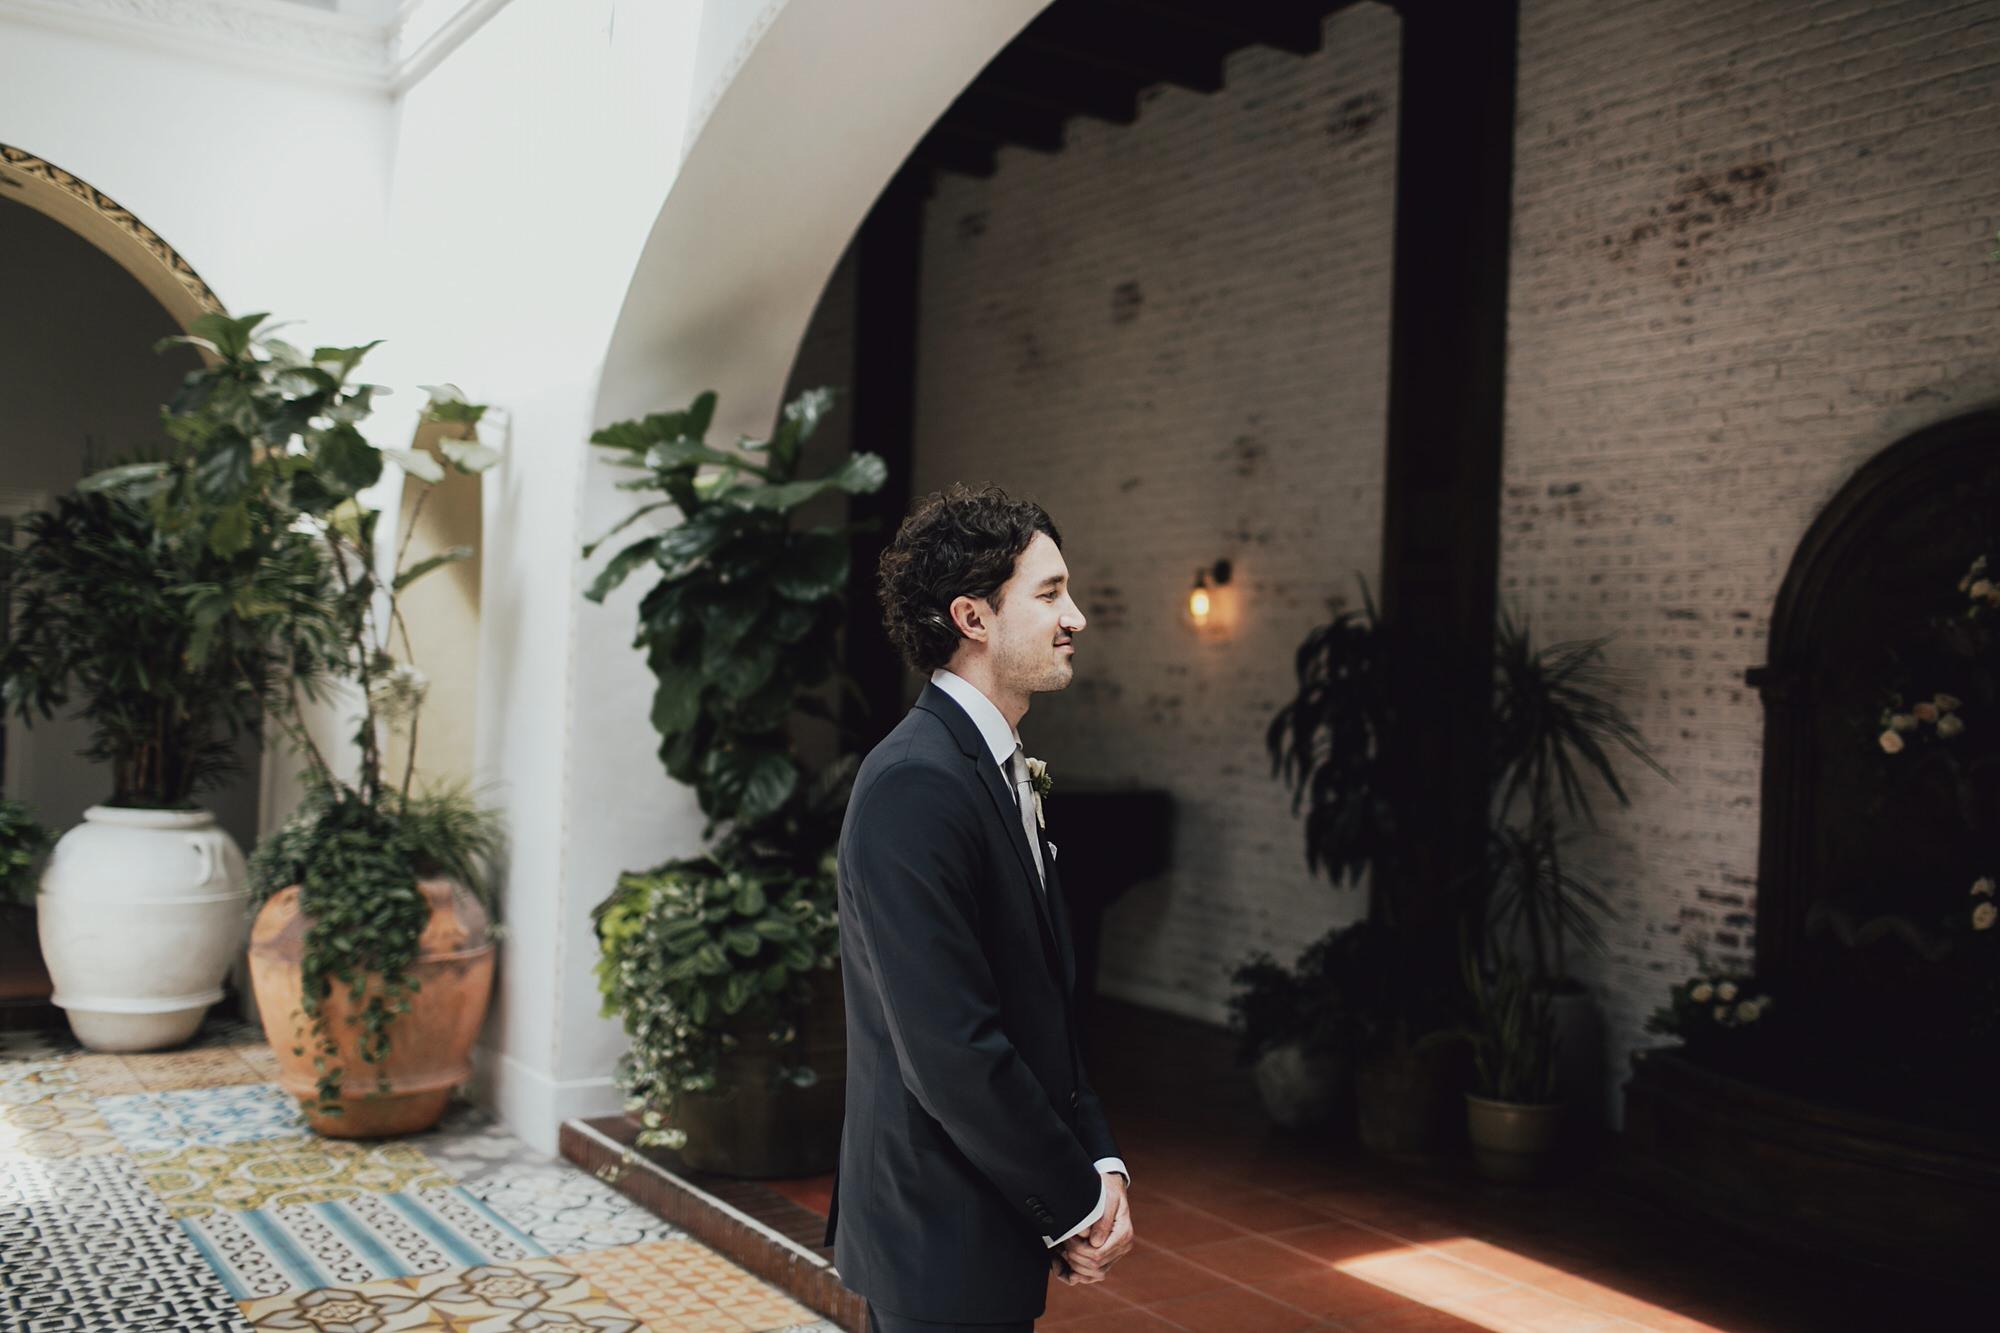 ken awaiting his bride